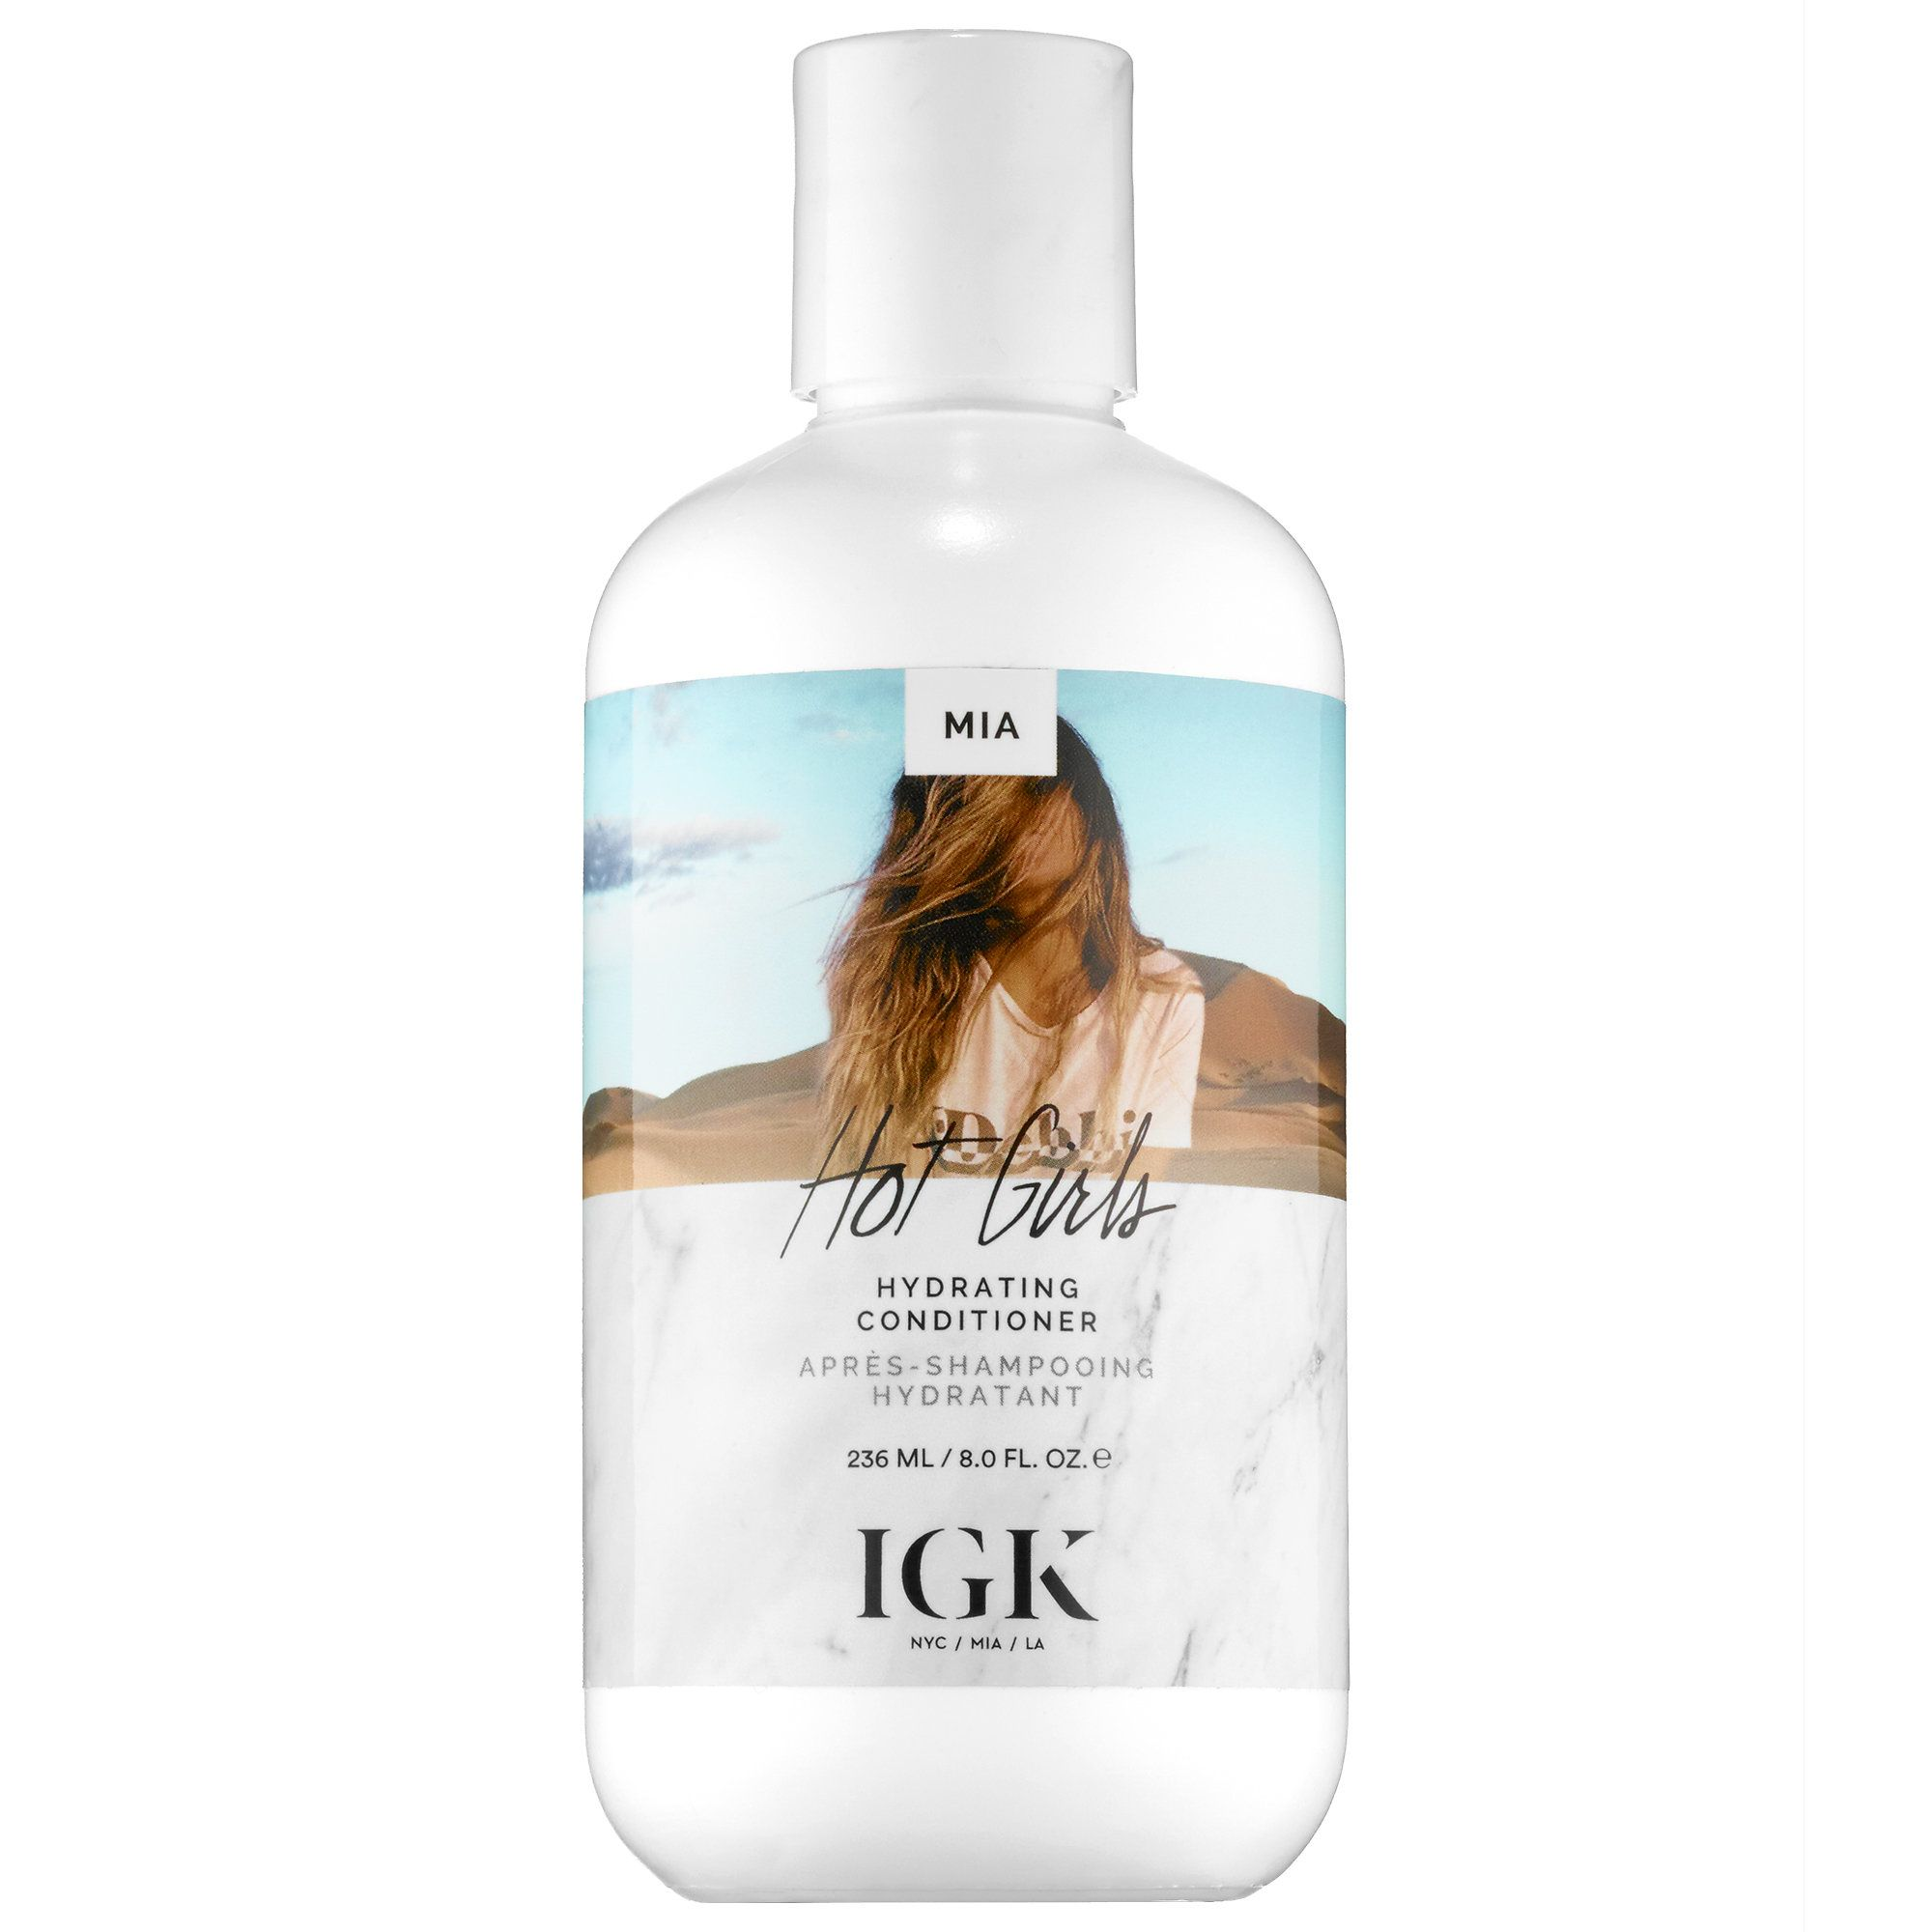 Shop IGKus Hot Girls Hydrating Conditioner at Sephora IGK hair